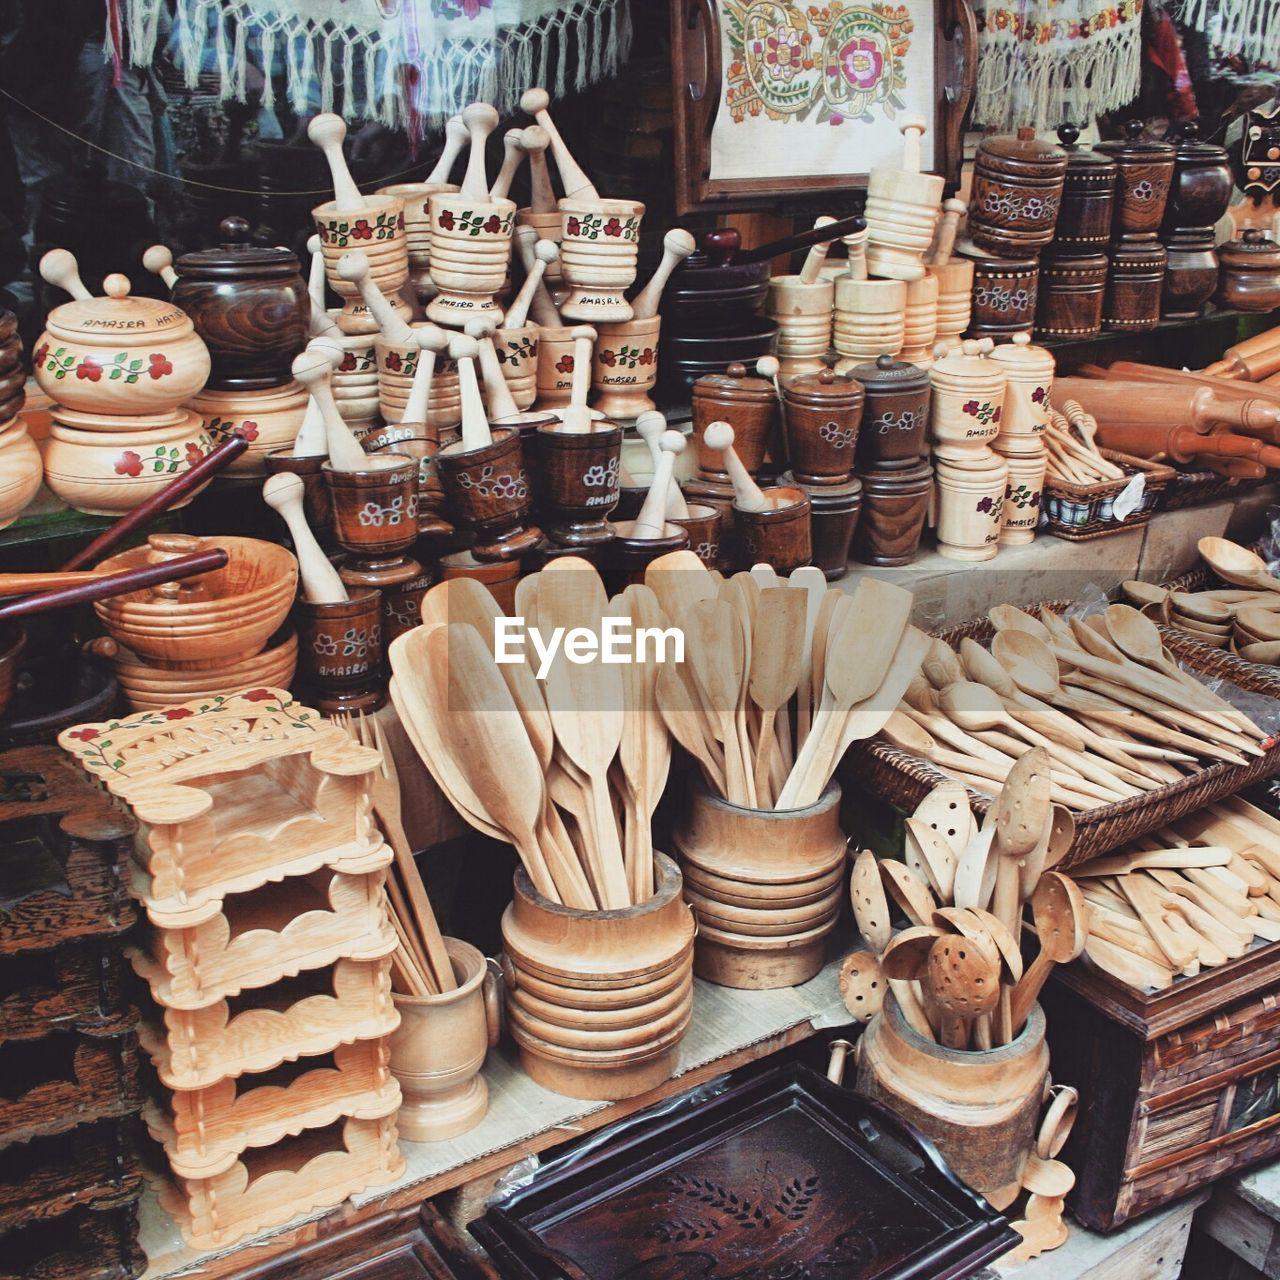 Wooden utensils displayed at market